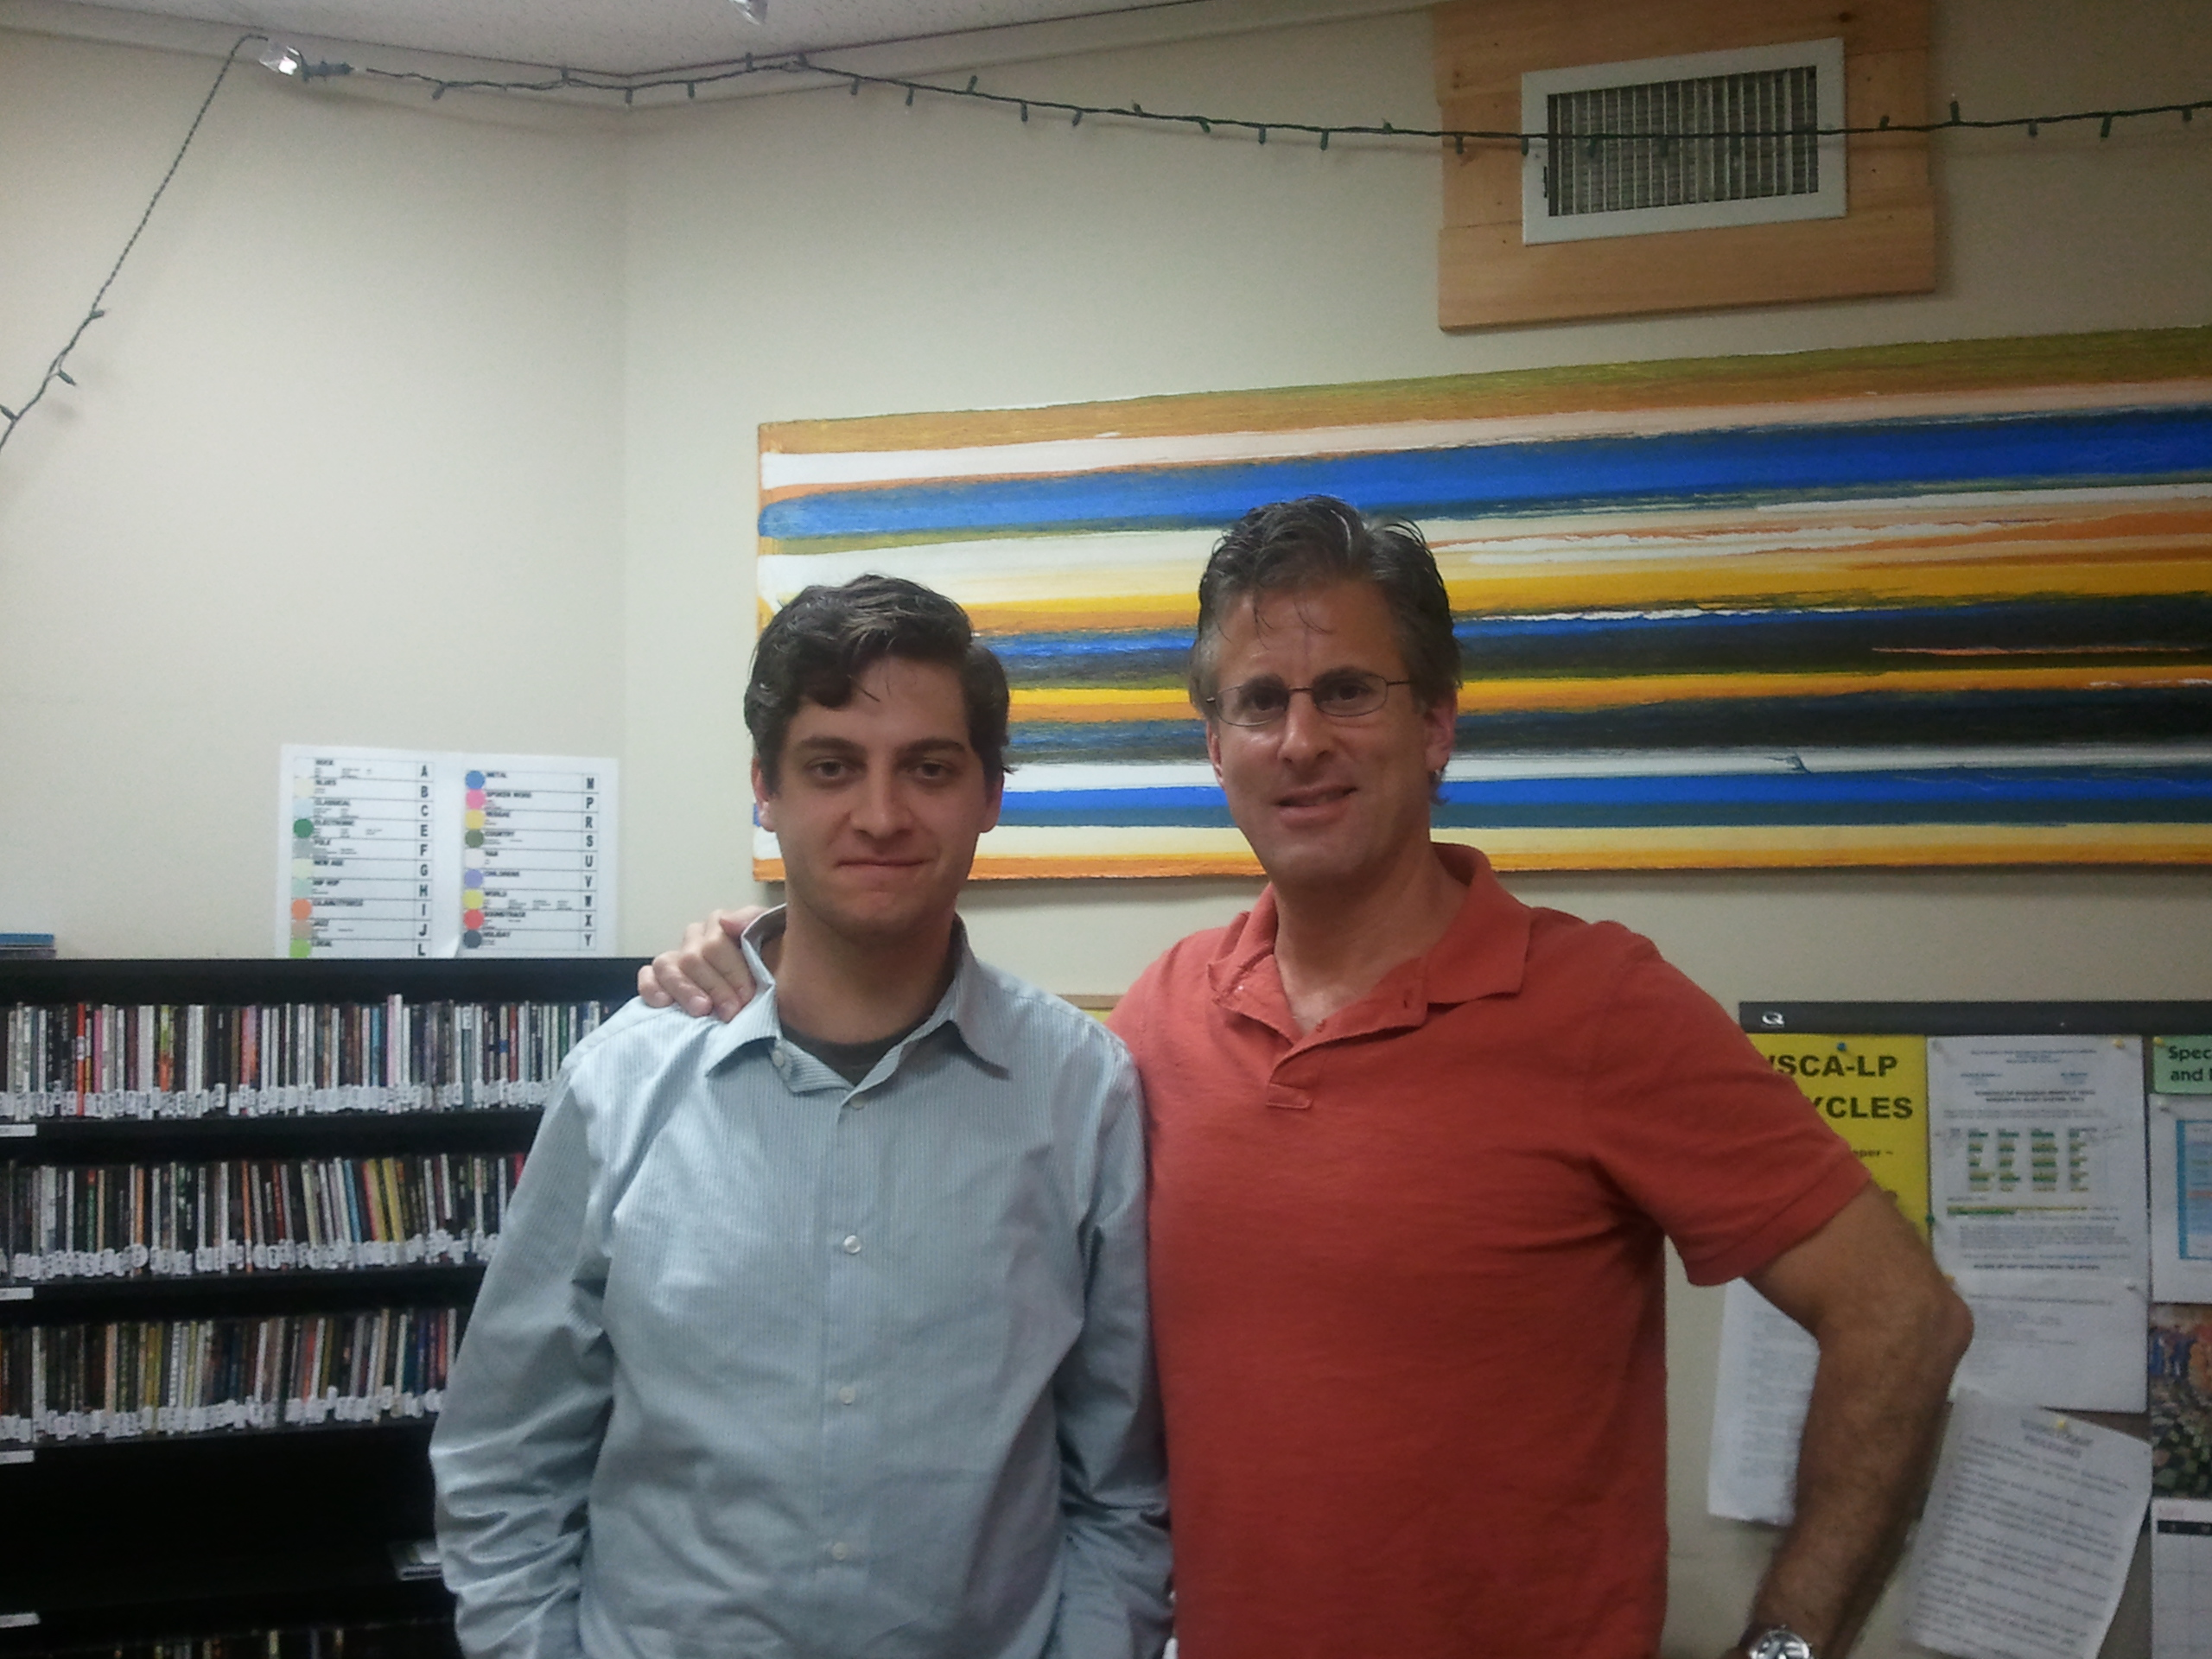 Mike Finger & Dan Belforti at Portsmouth Community Radio, 106.1 FM